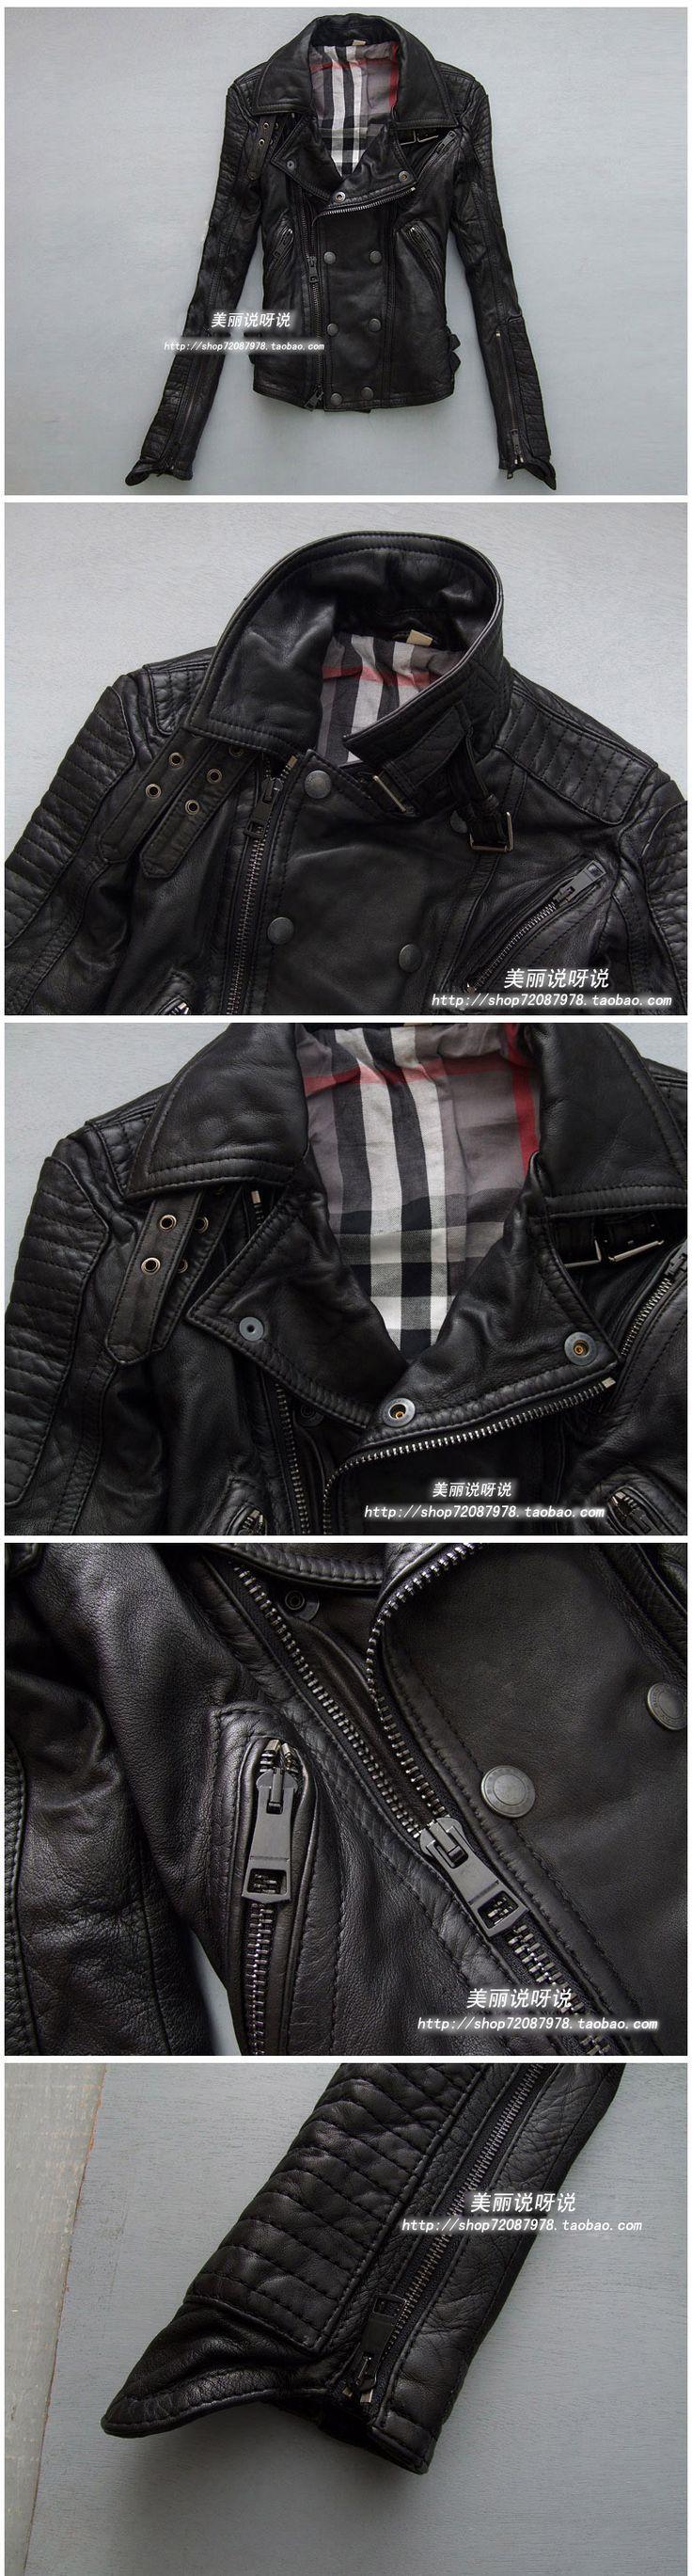 Classic Fashion Star Style Motorcycle Genuine Leather Clothing Pure Sheepskin Leather Jacket Female S-2xl